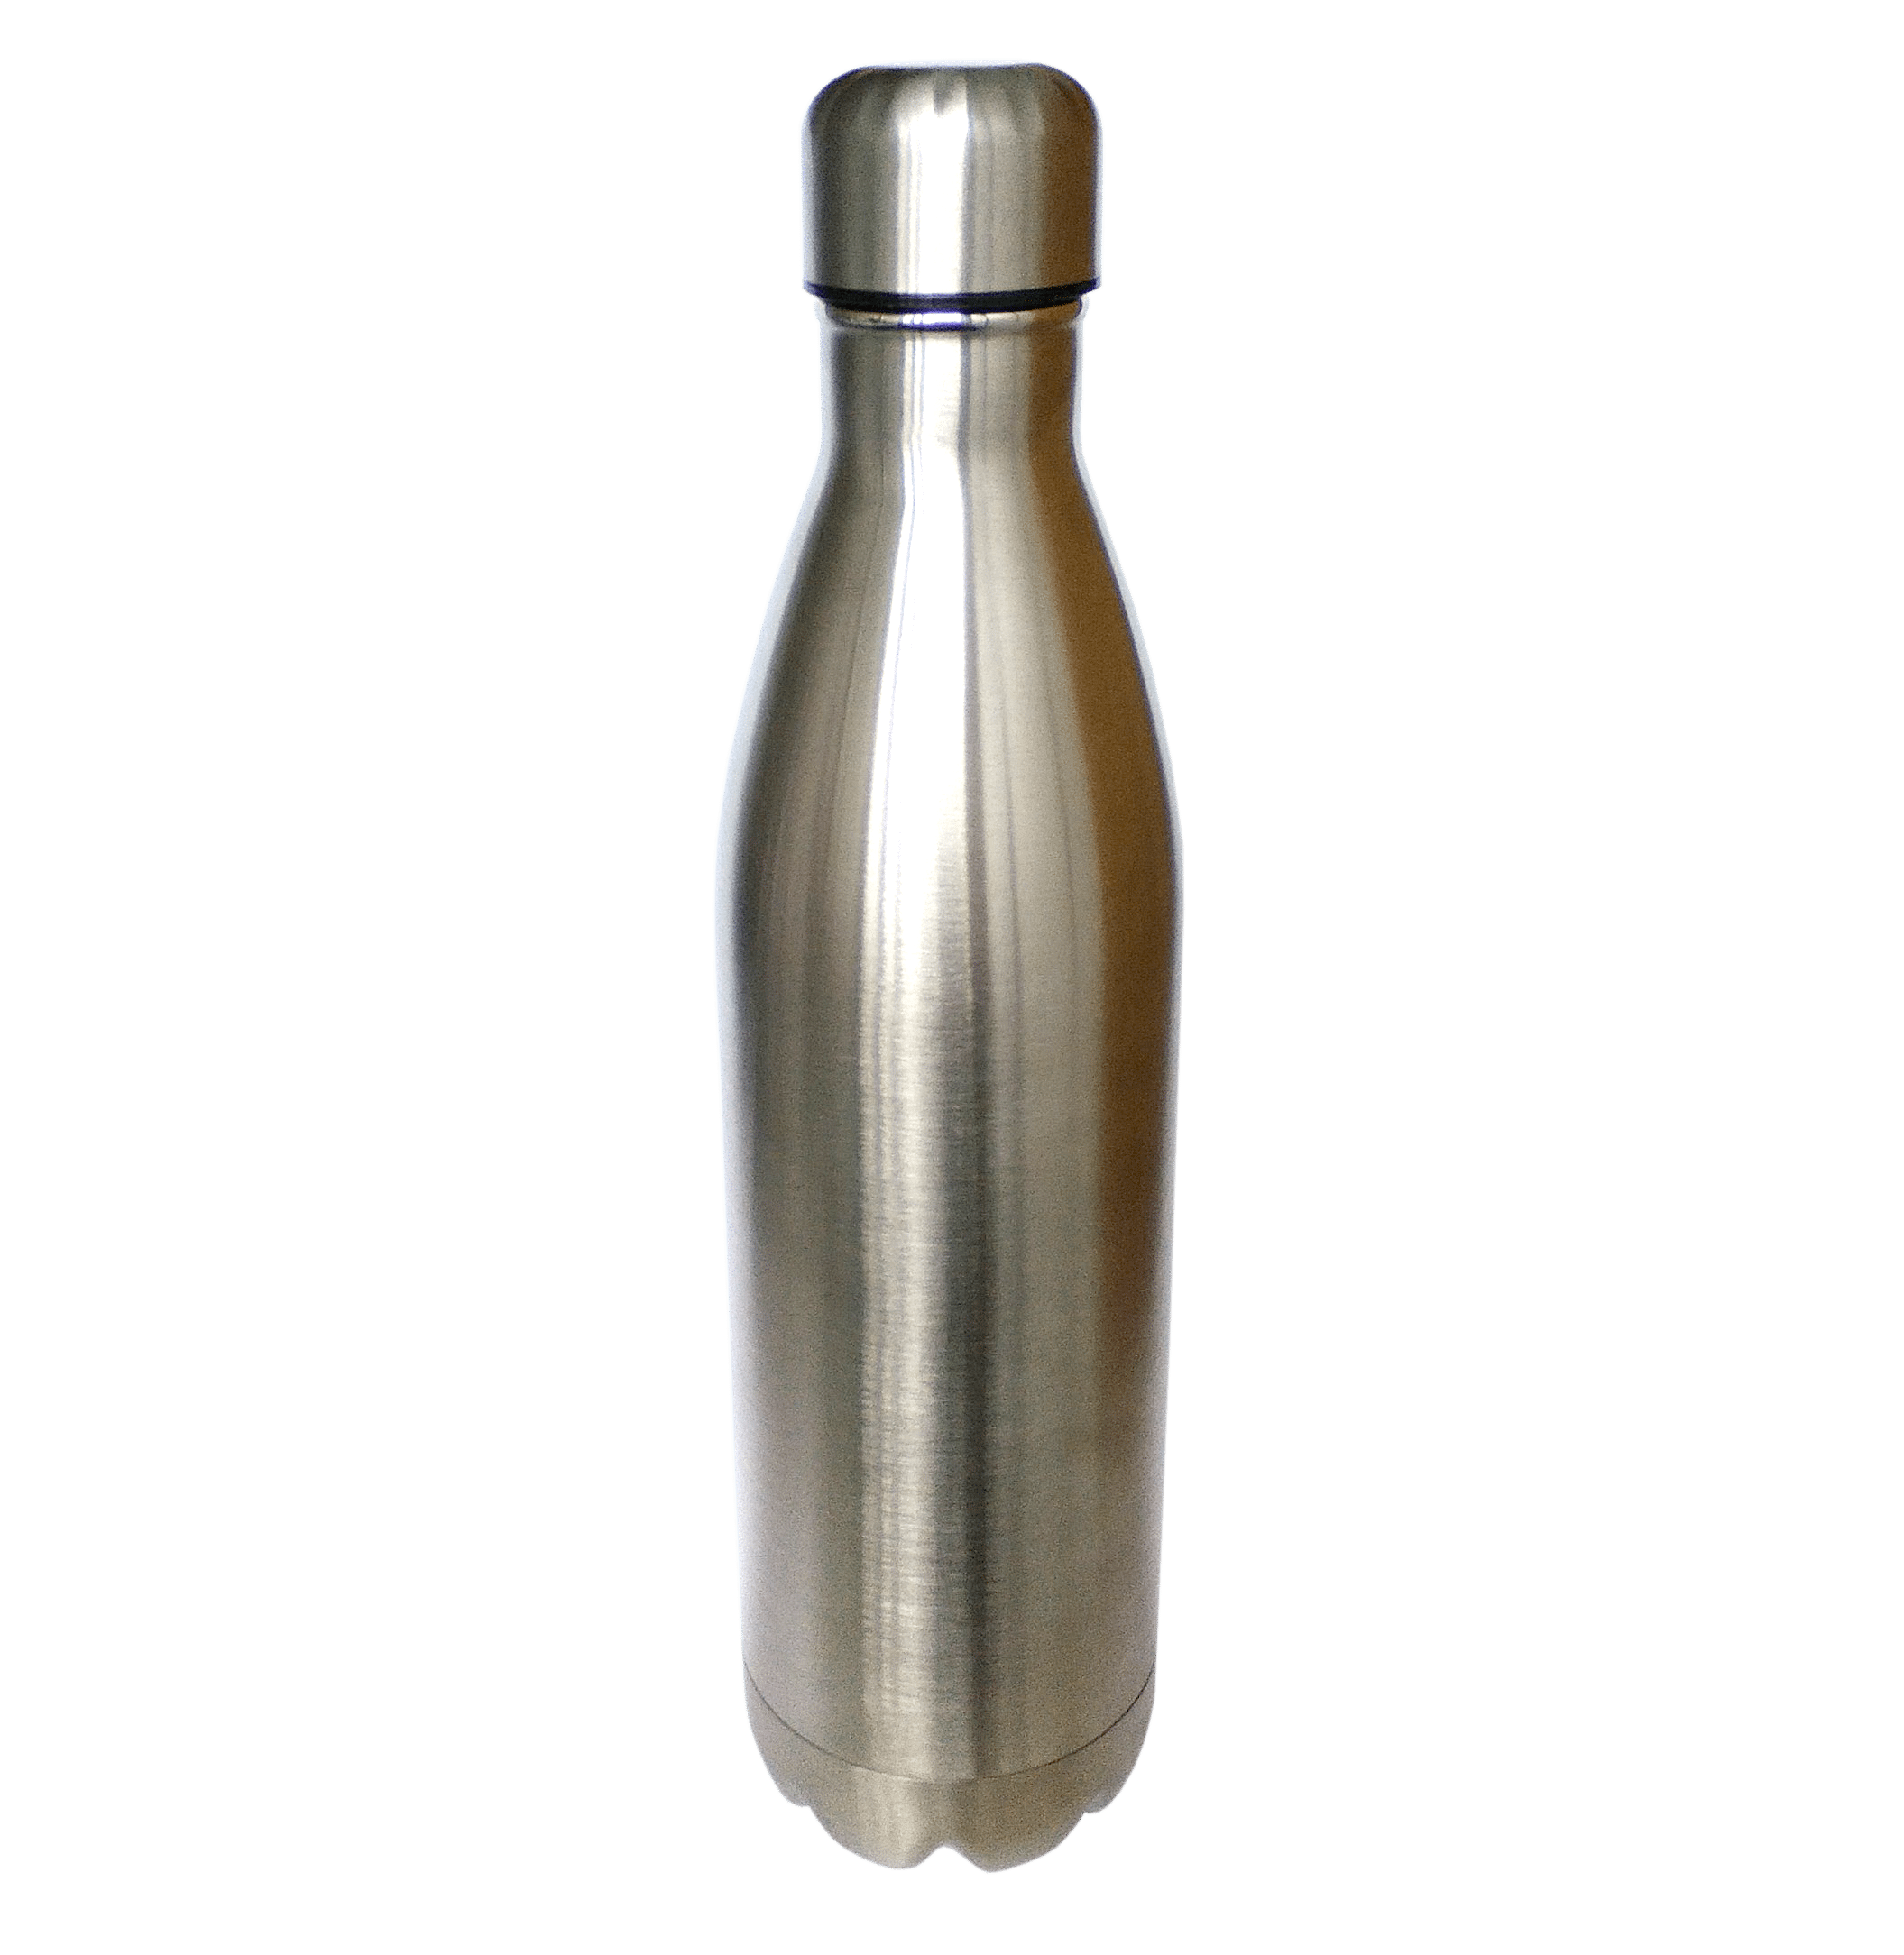 vandflaske i rustfri stål